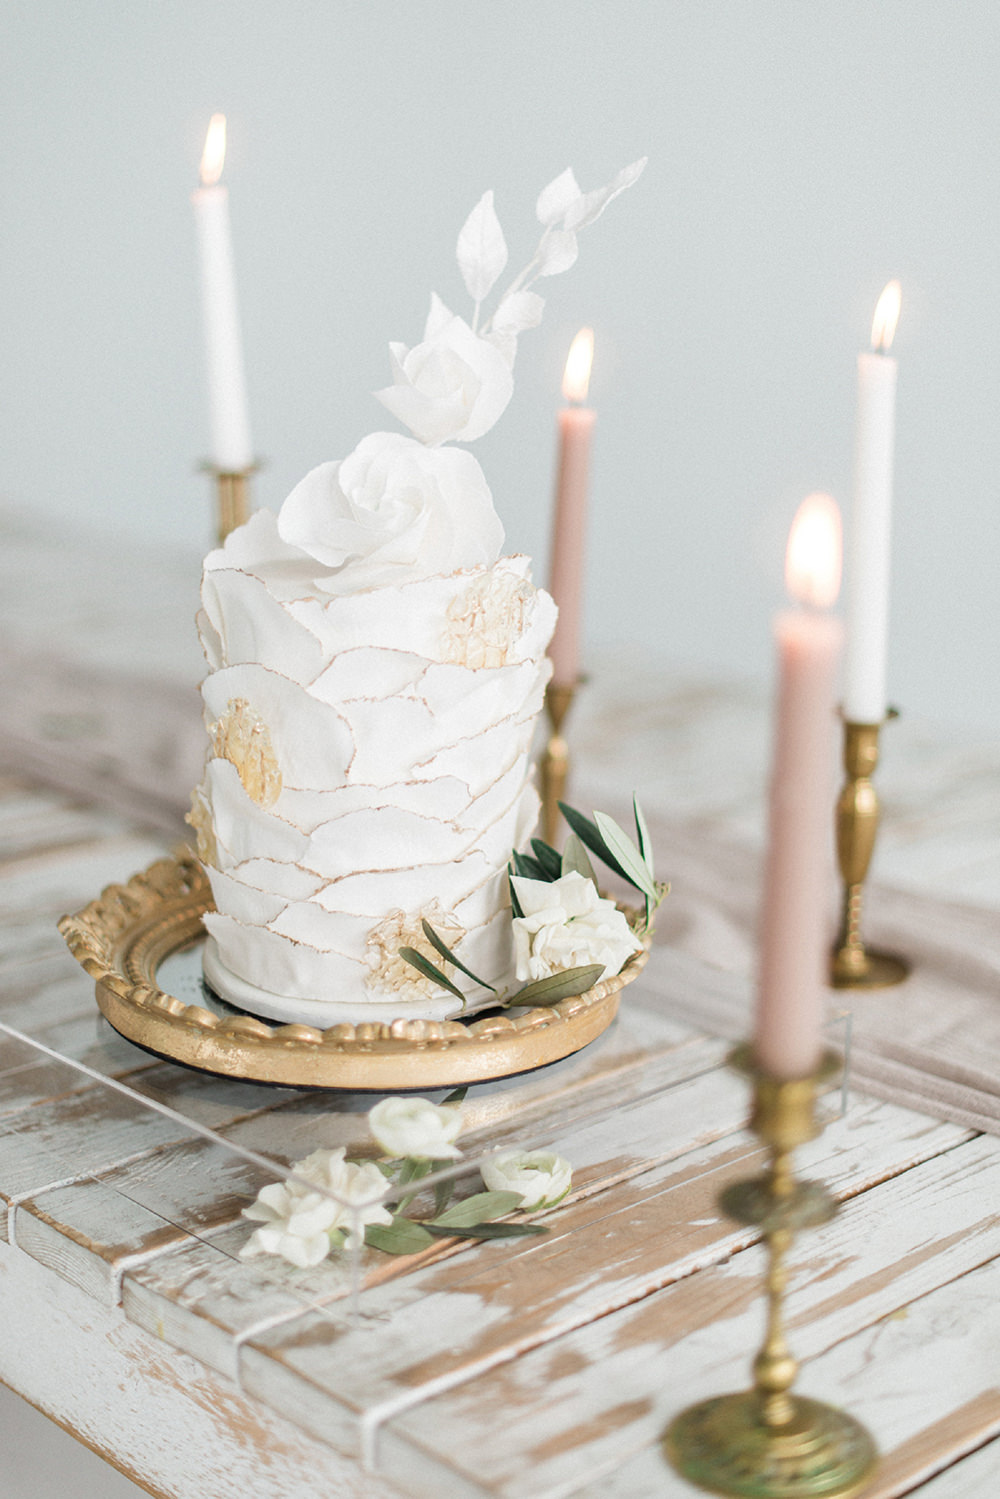 romantic wedding cakes - photo by Laura Kelly Photography https://ruffledblog.com/minimalist-monochrome-european-wedding-inspiration